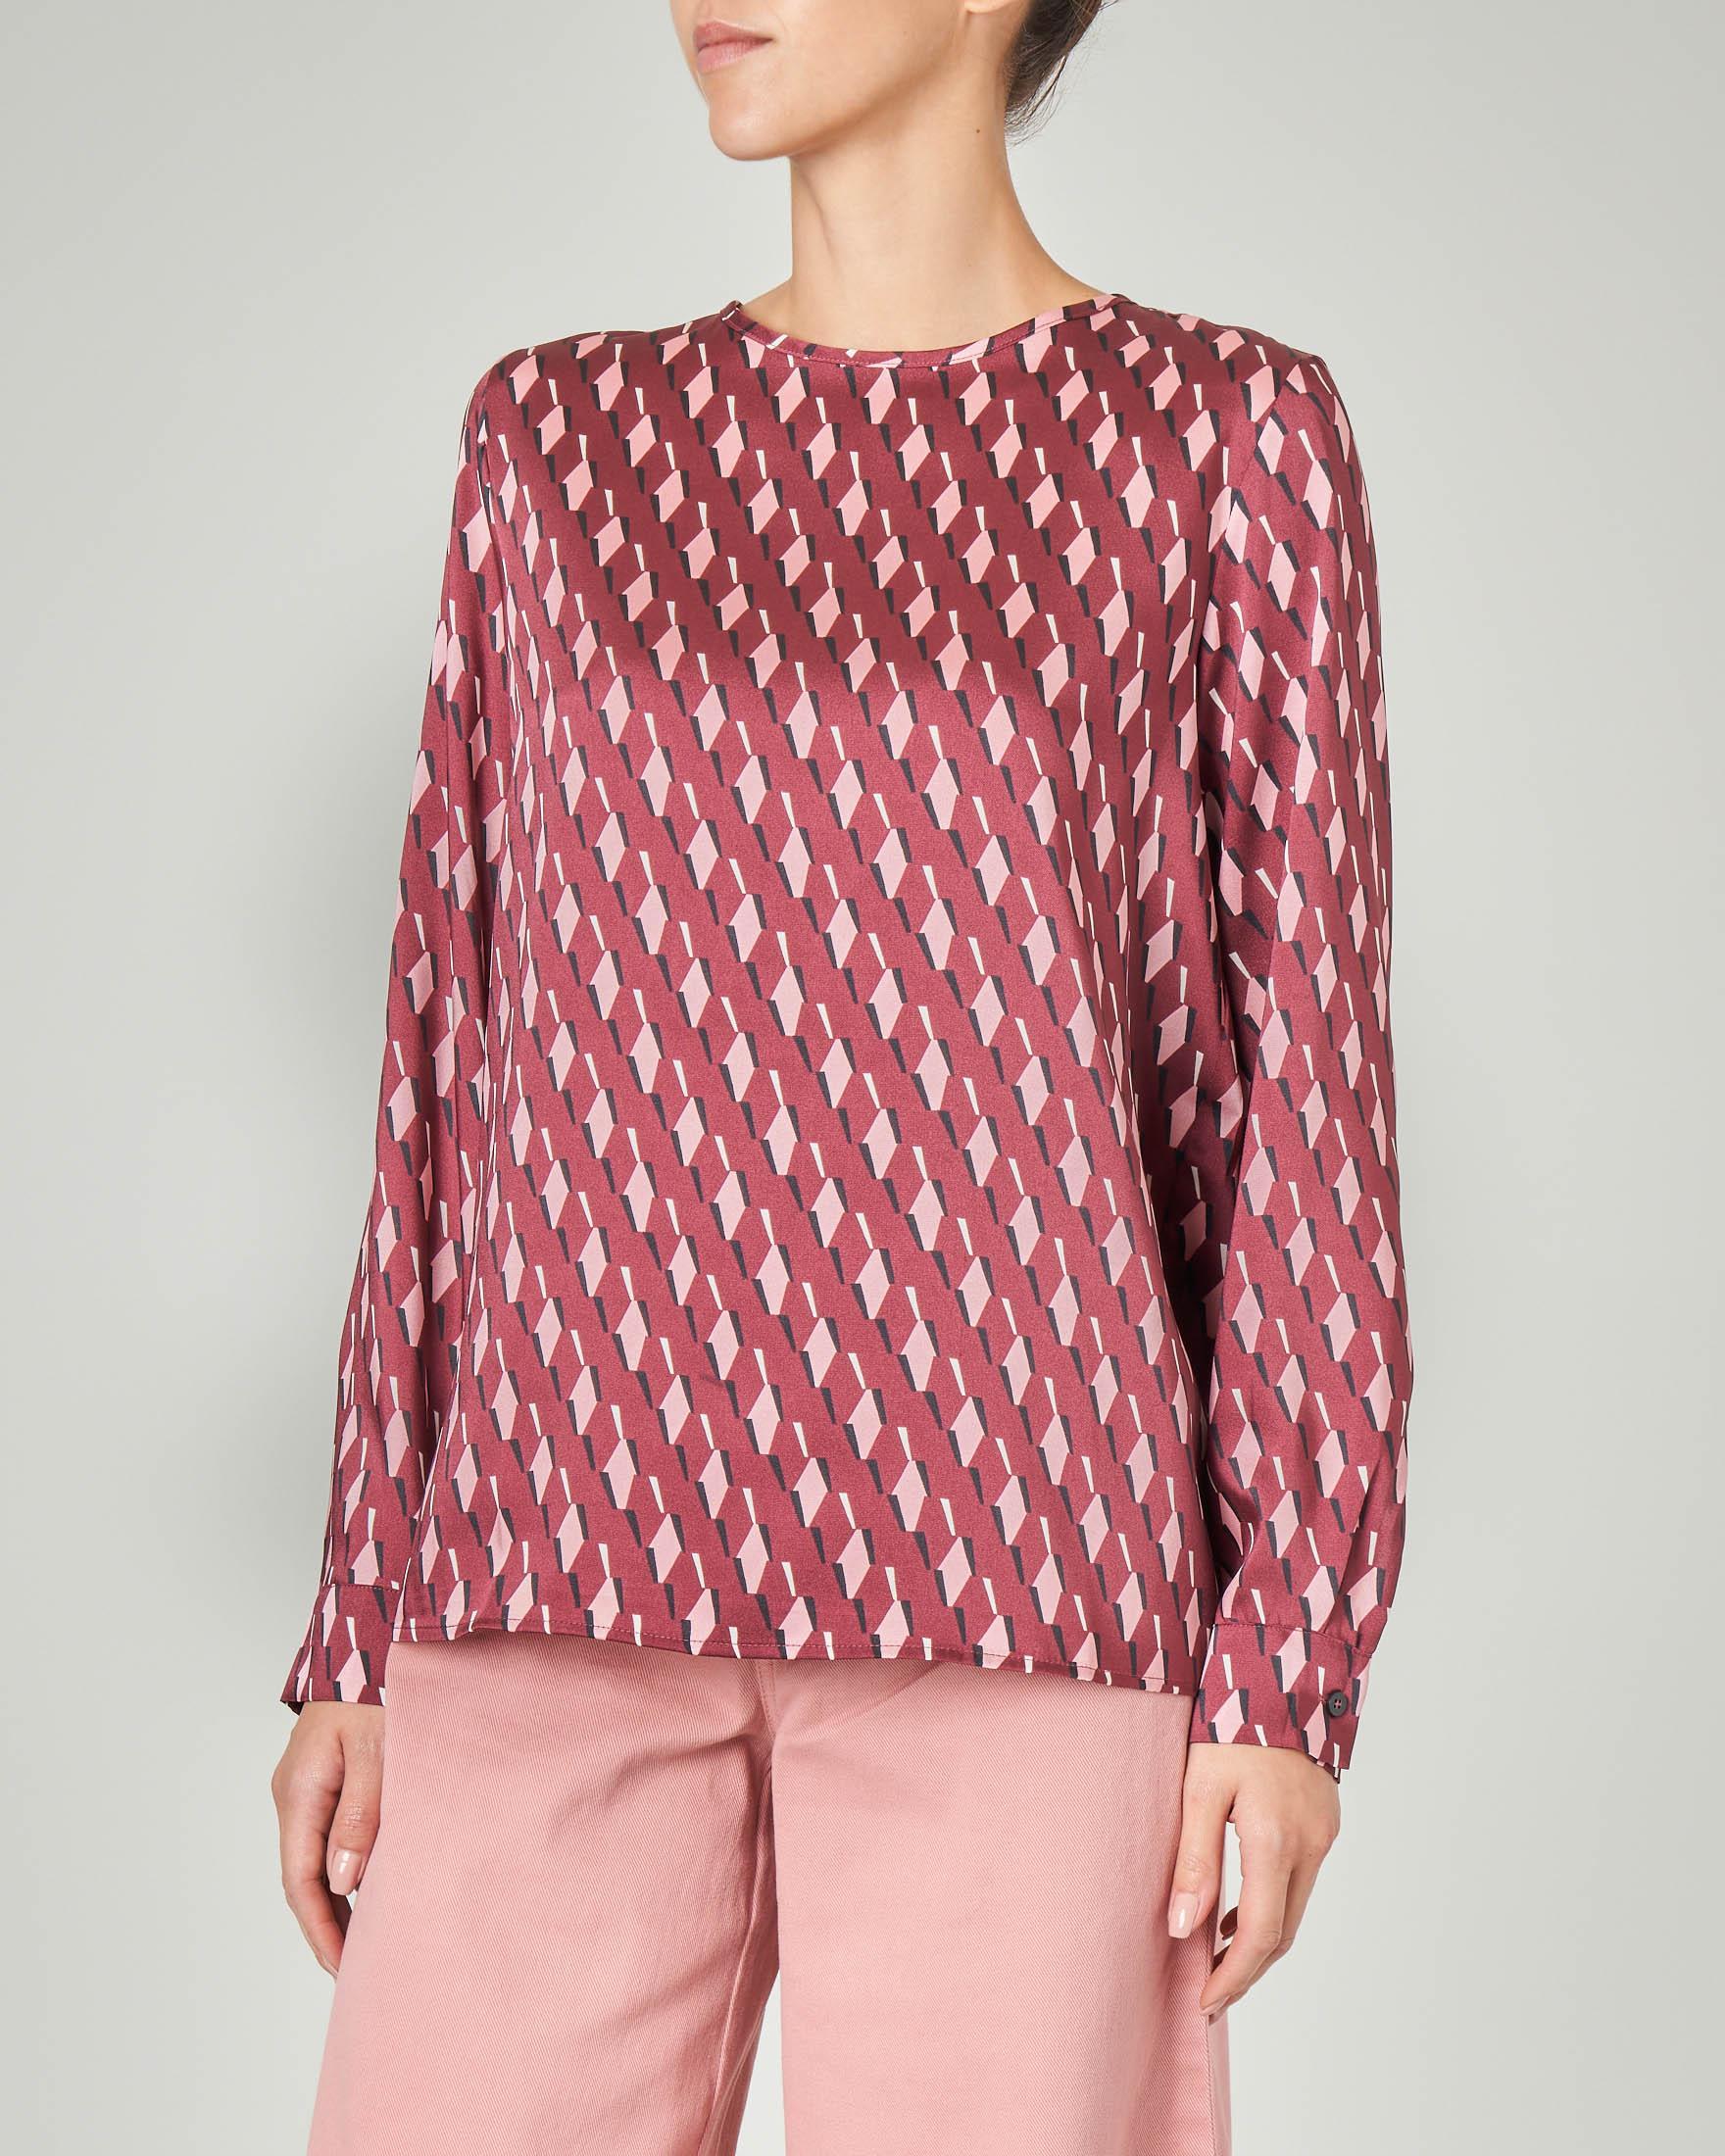 Blusa linea dritta bordeaux a stampa geometrica rombi rosa